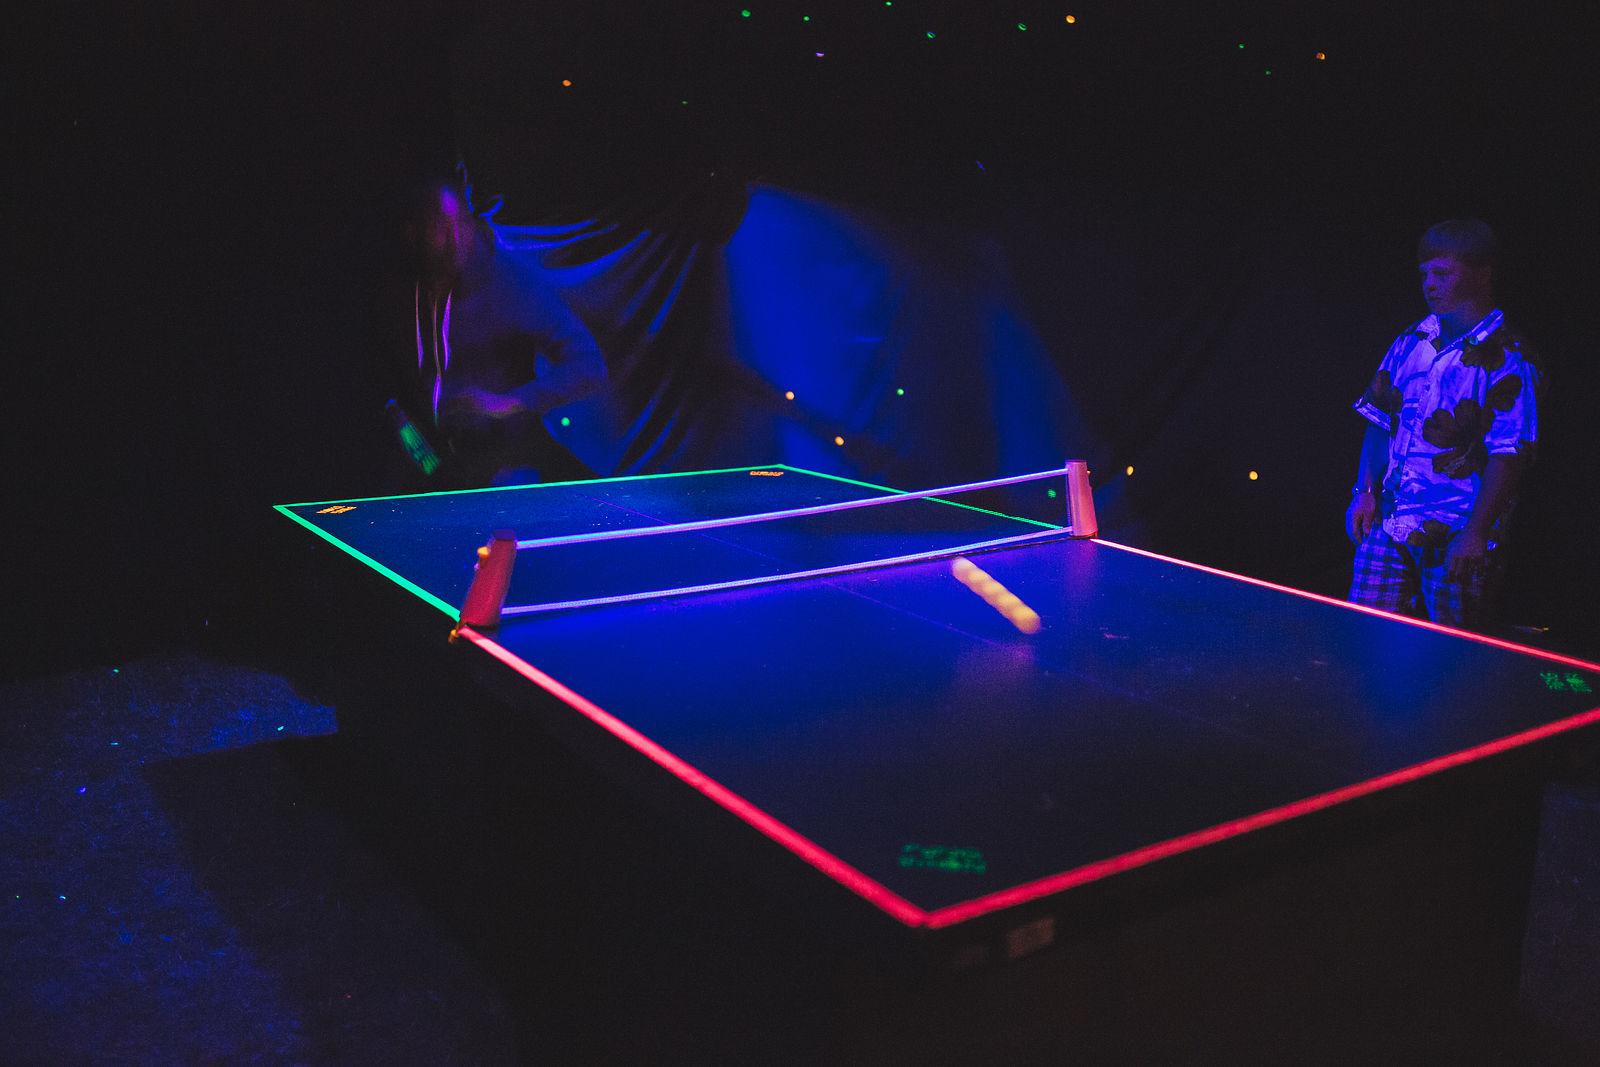 Tron Ping Pong